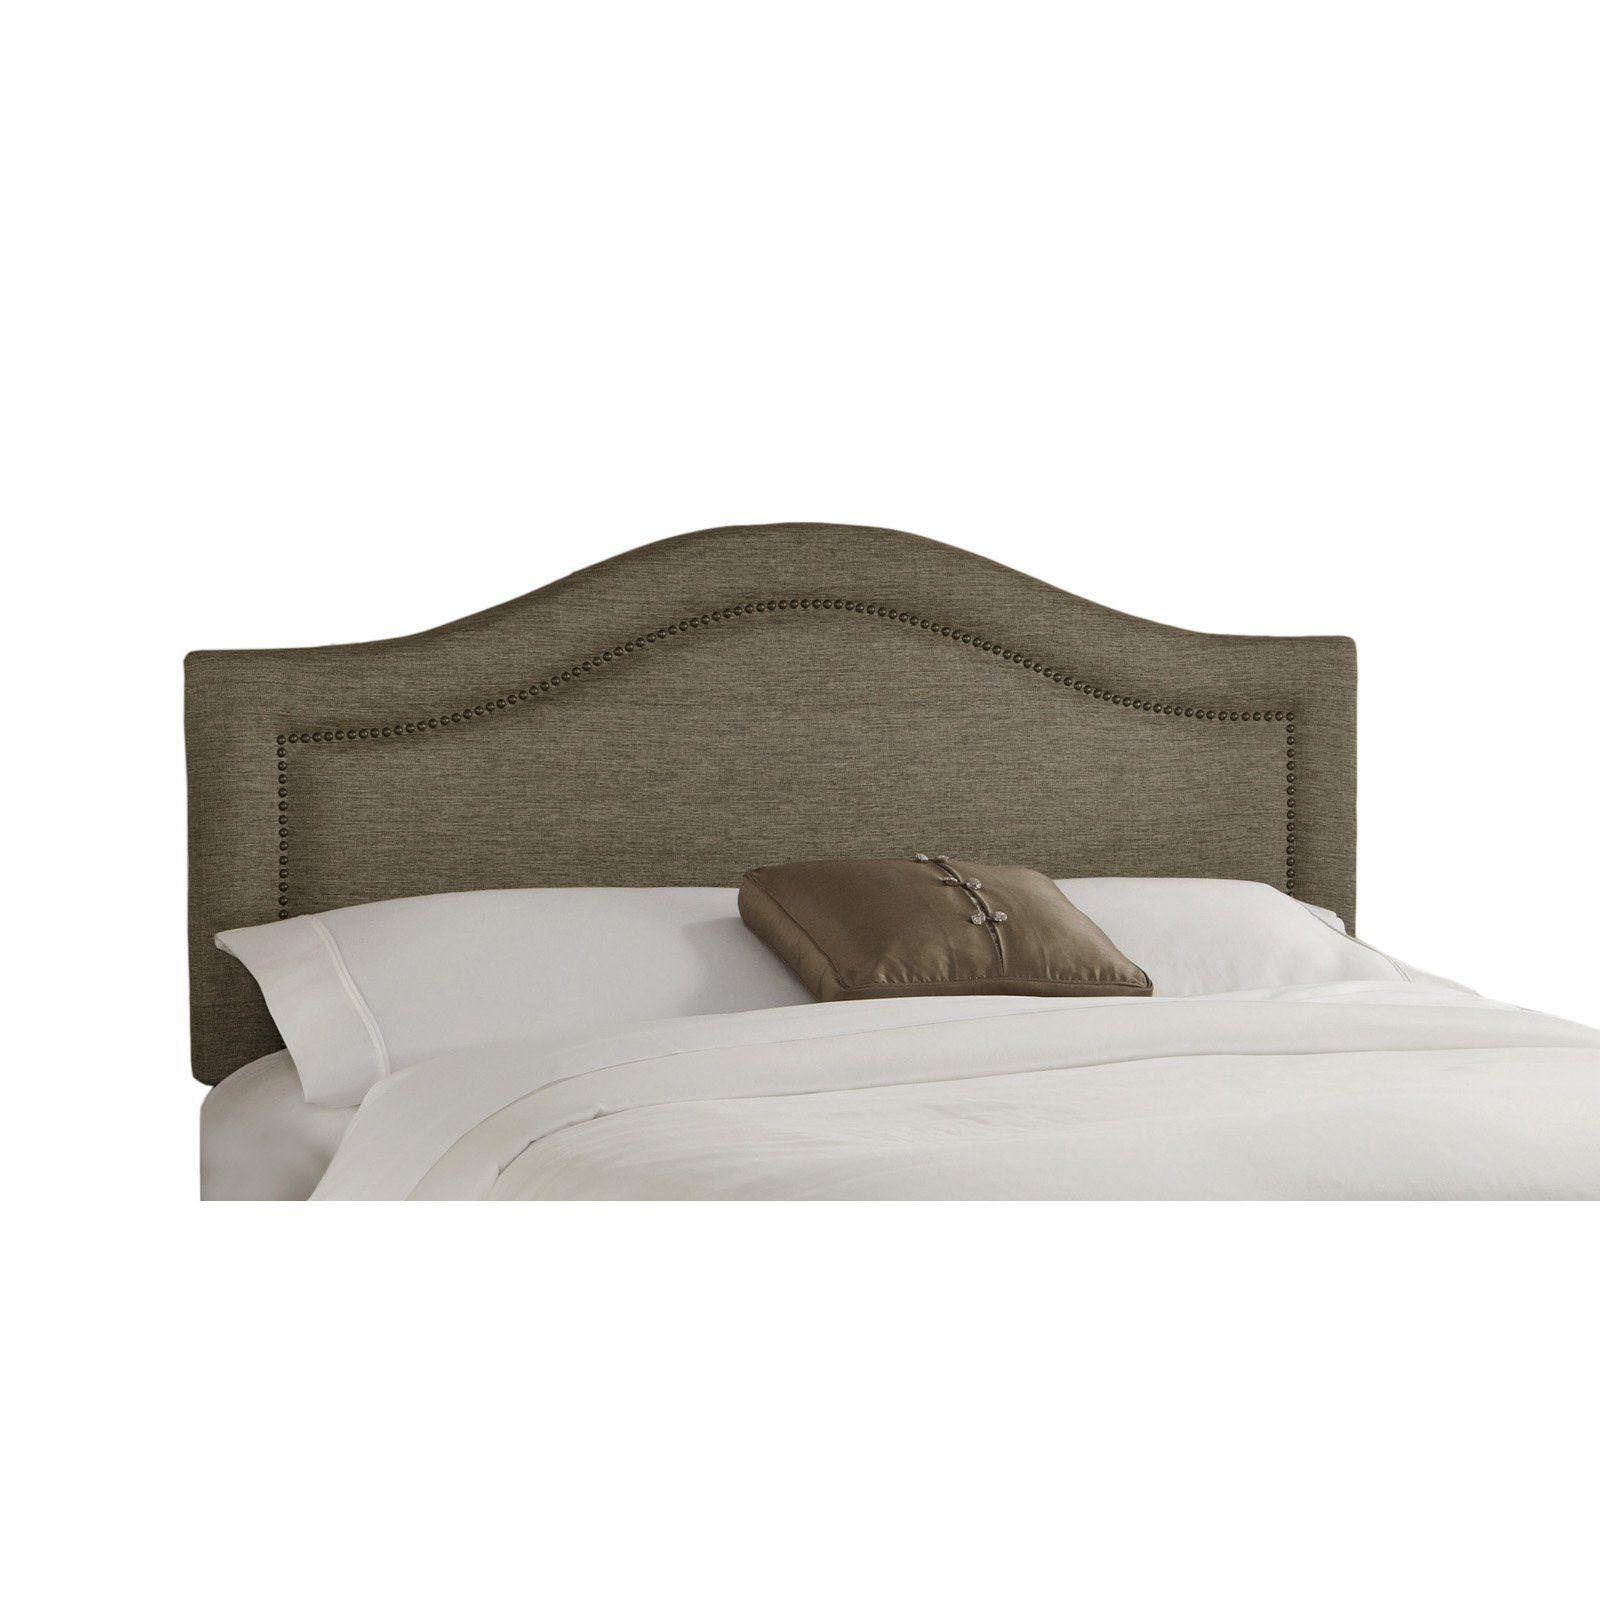 Nail Head Trim Upholstered Headboard Upholstered Headboard Bed